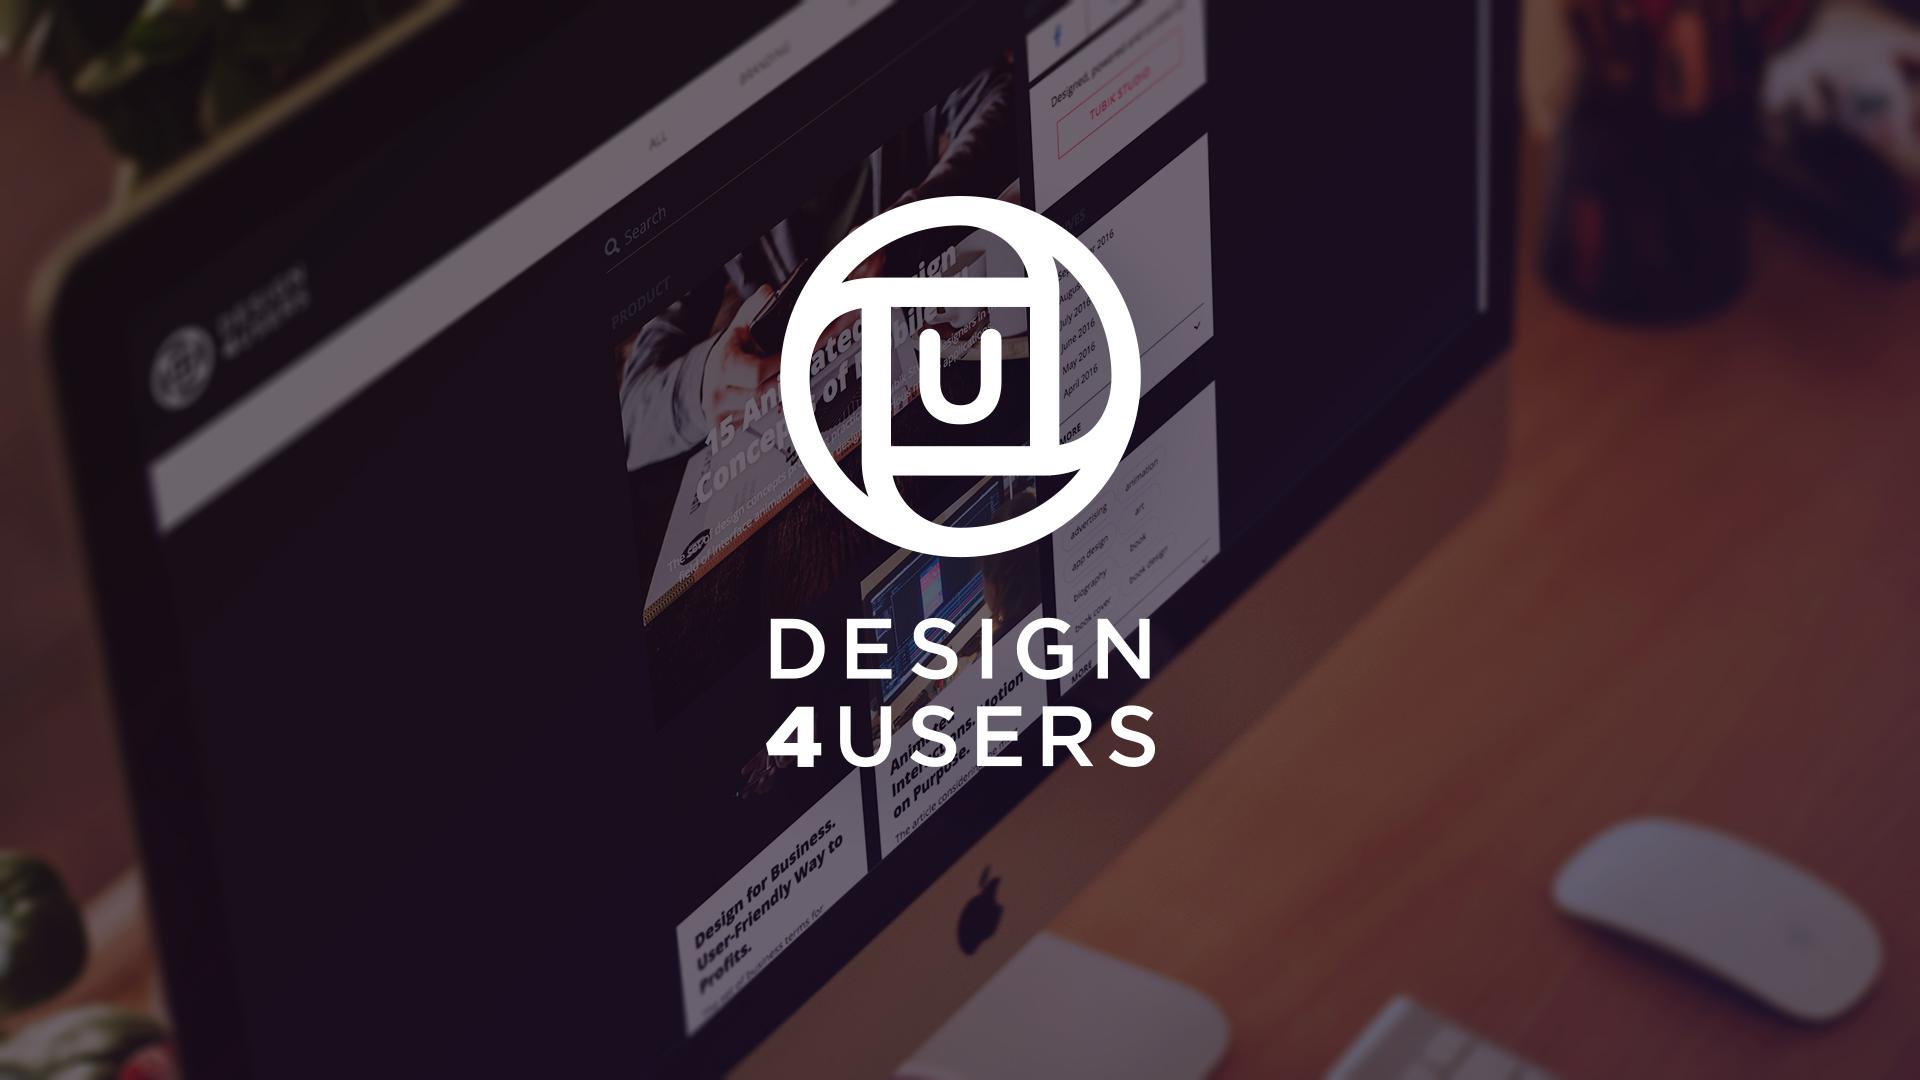 D4U design4users